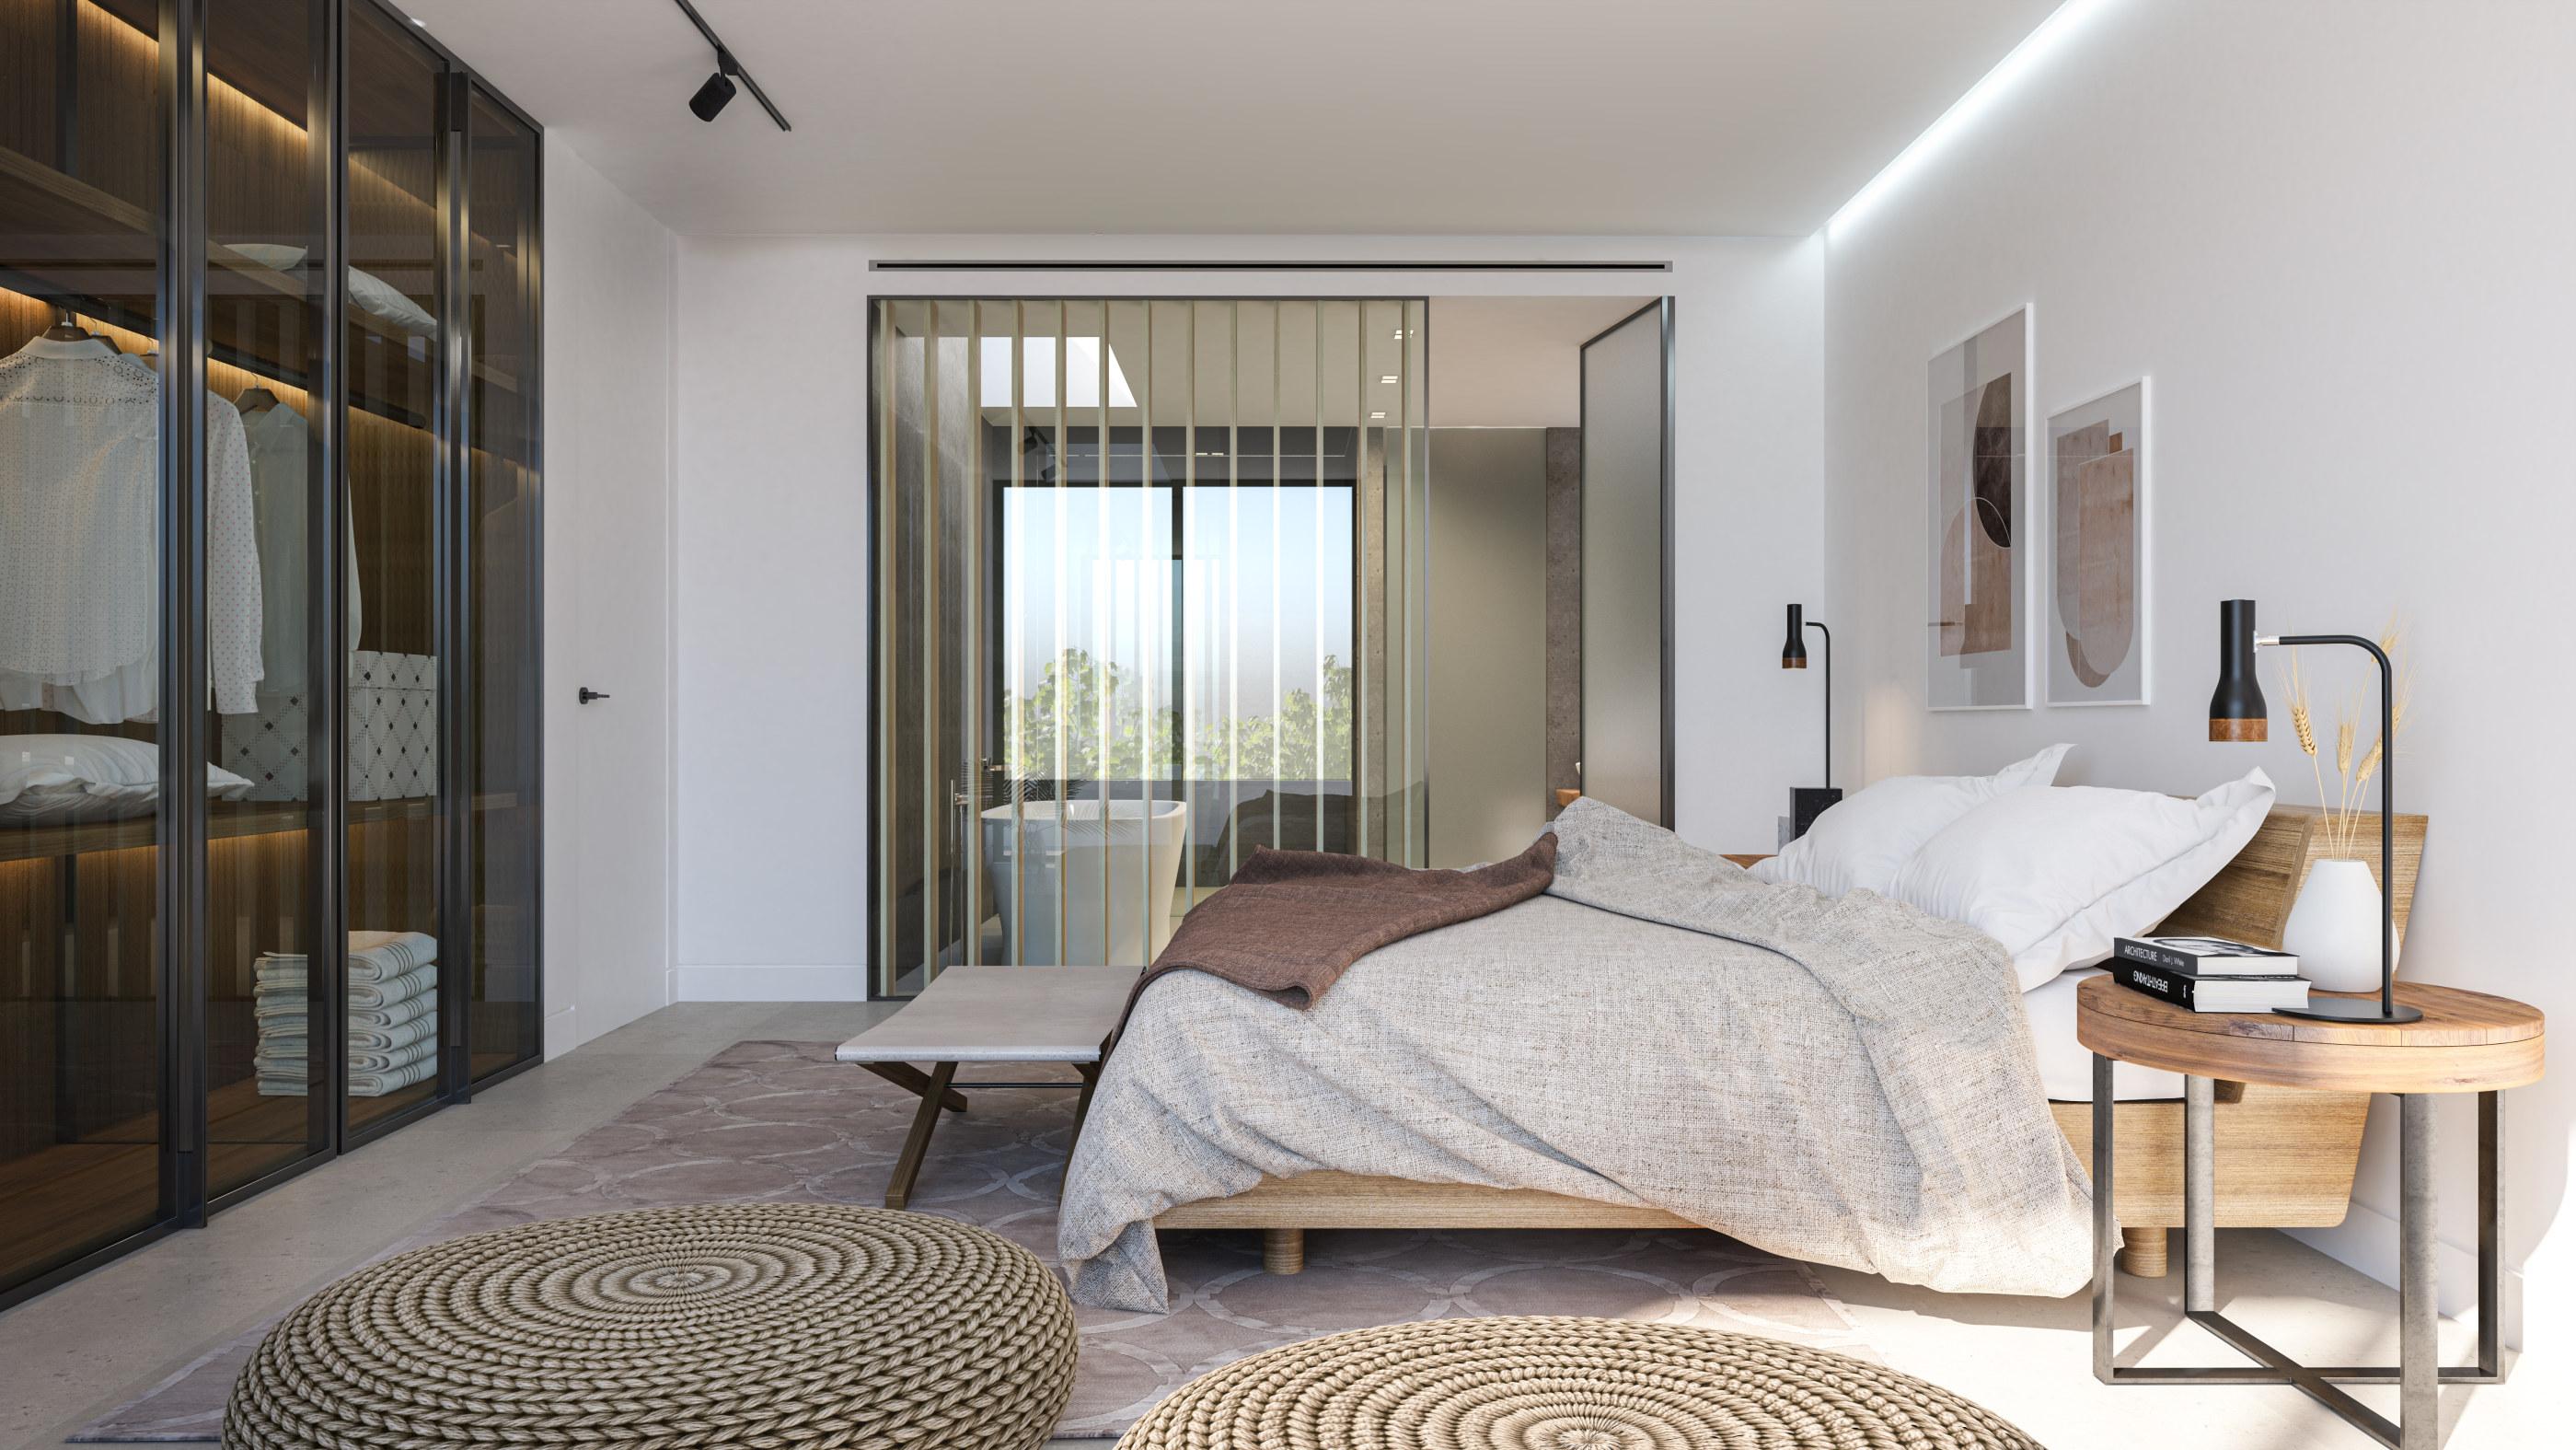 MEXICO_RLH_MAYAKOBA SECUND_Dormitorio